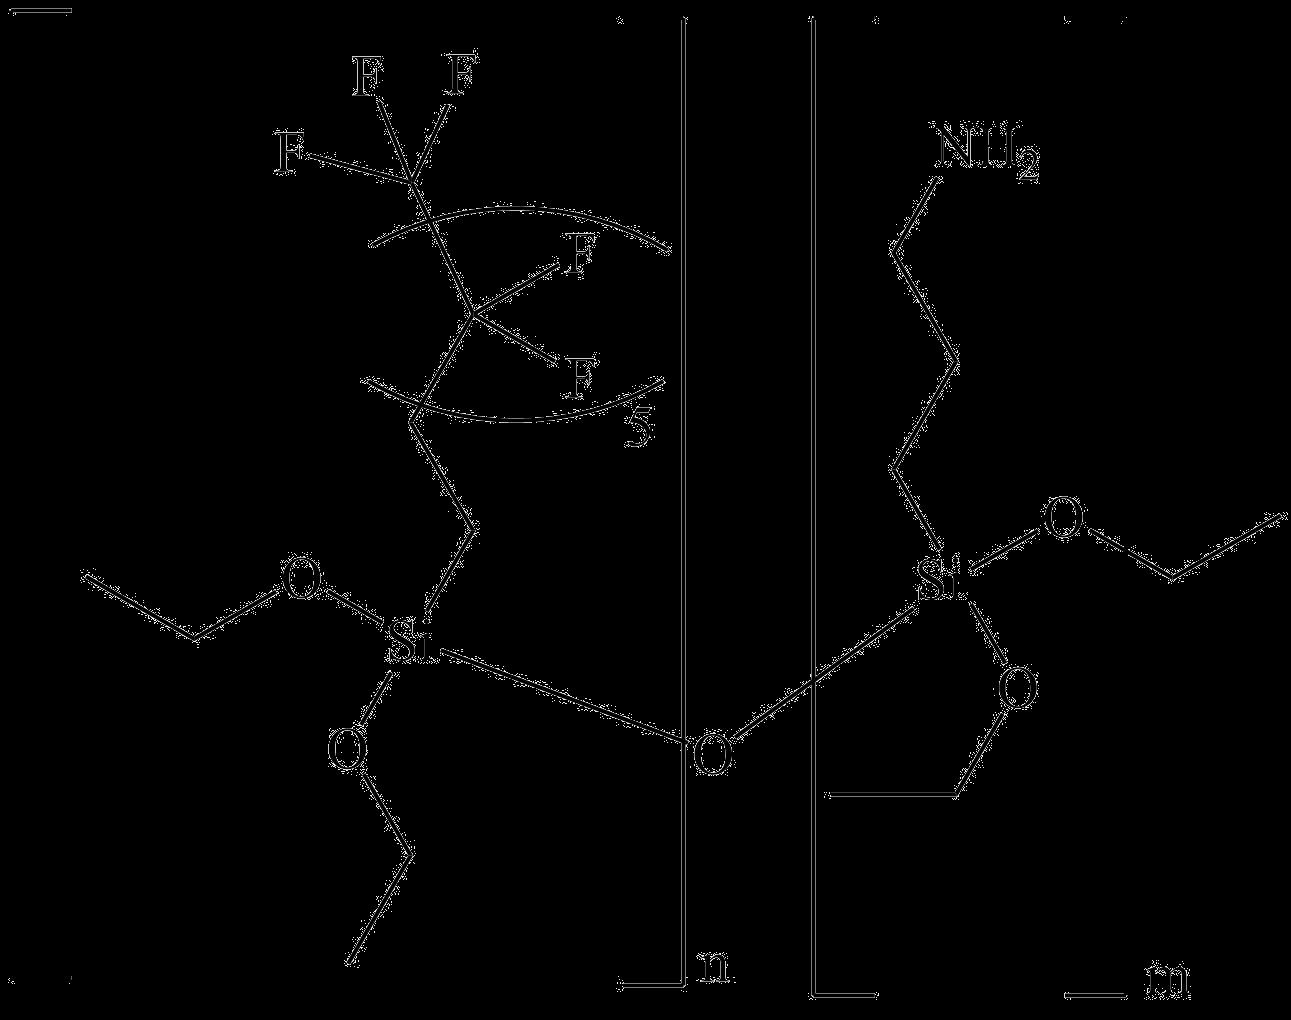 185911-29-9 & 58160-99-9